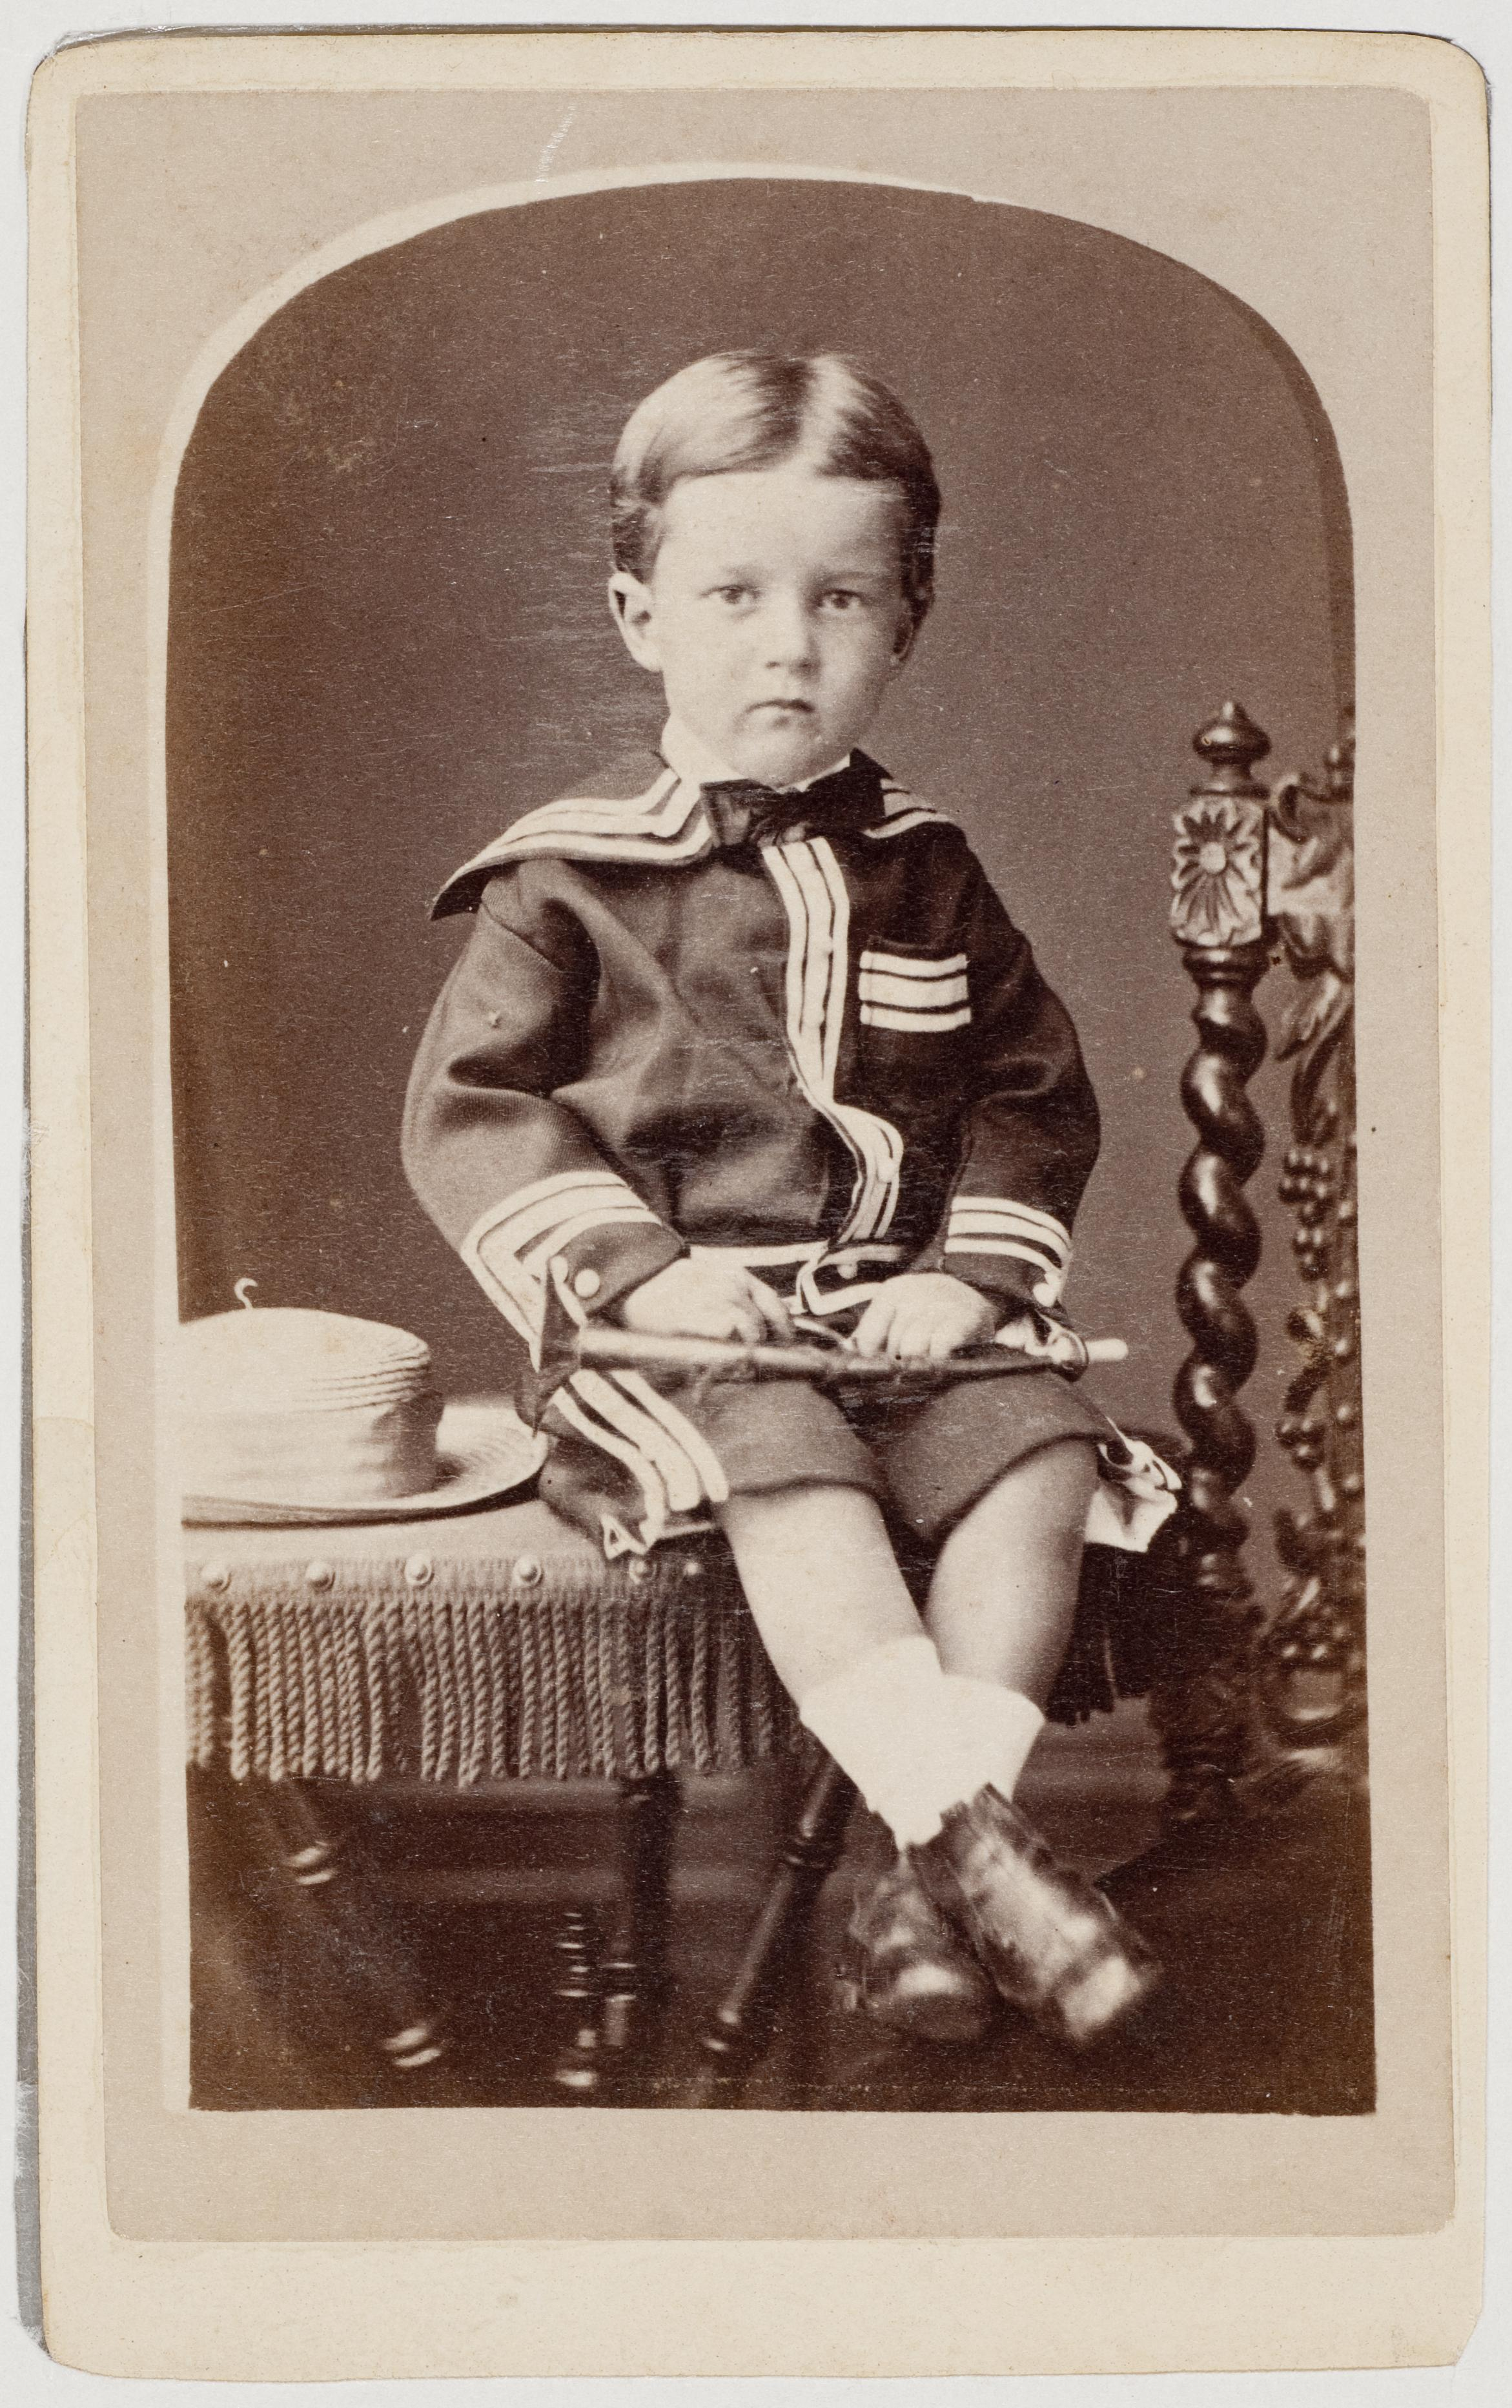 Frederick Farrand Trollope, 29th December 1878 / photographer Charles Collins, Grafton, NSW